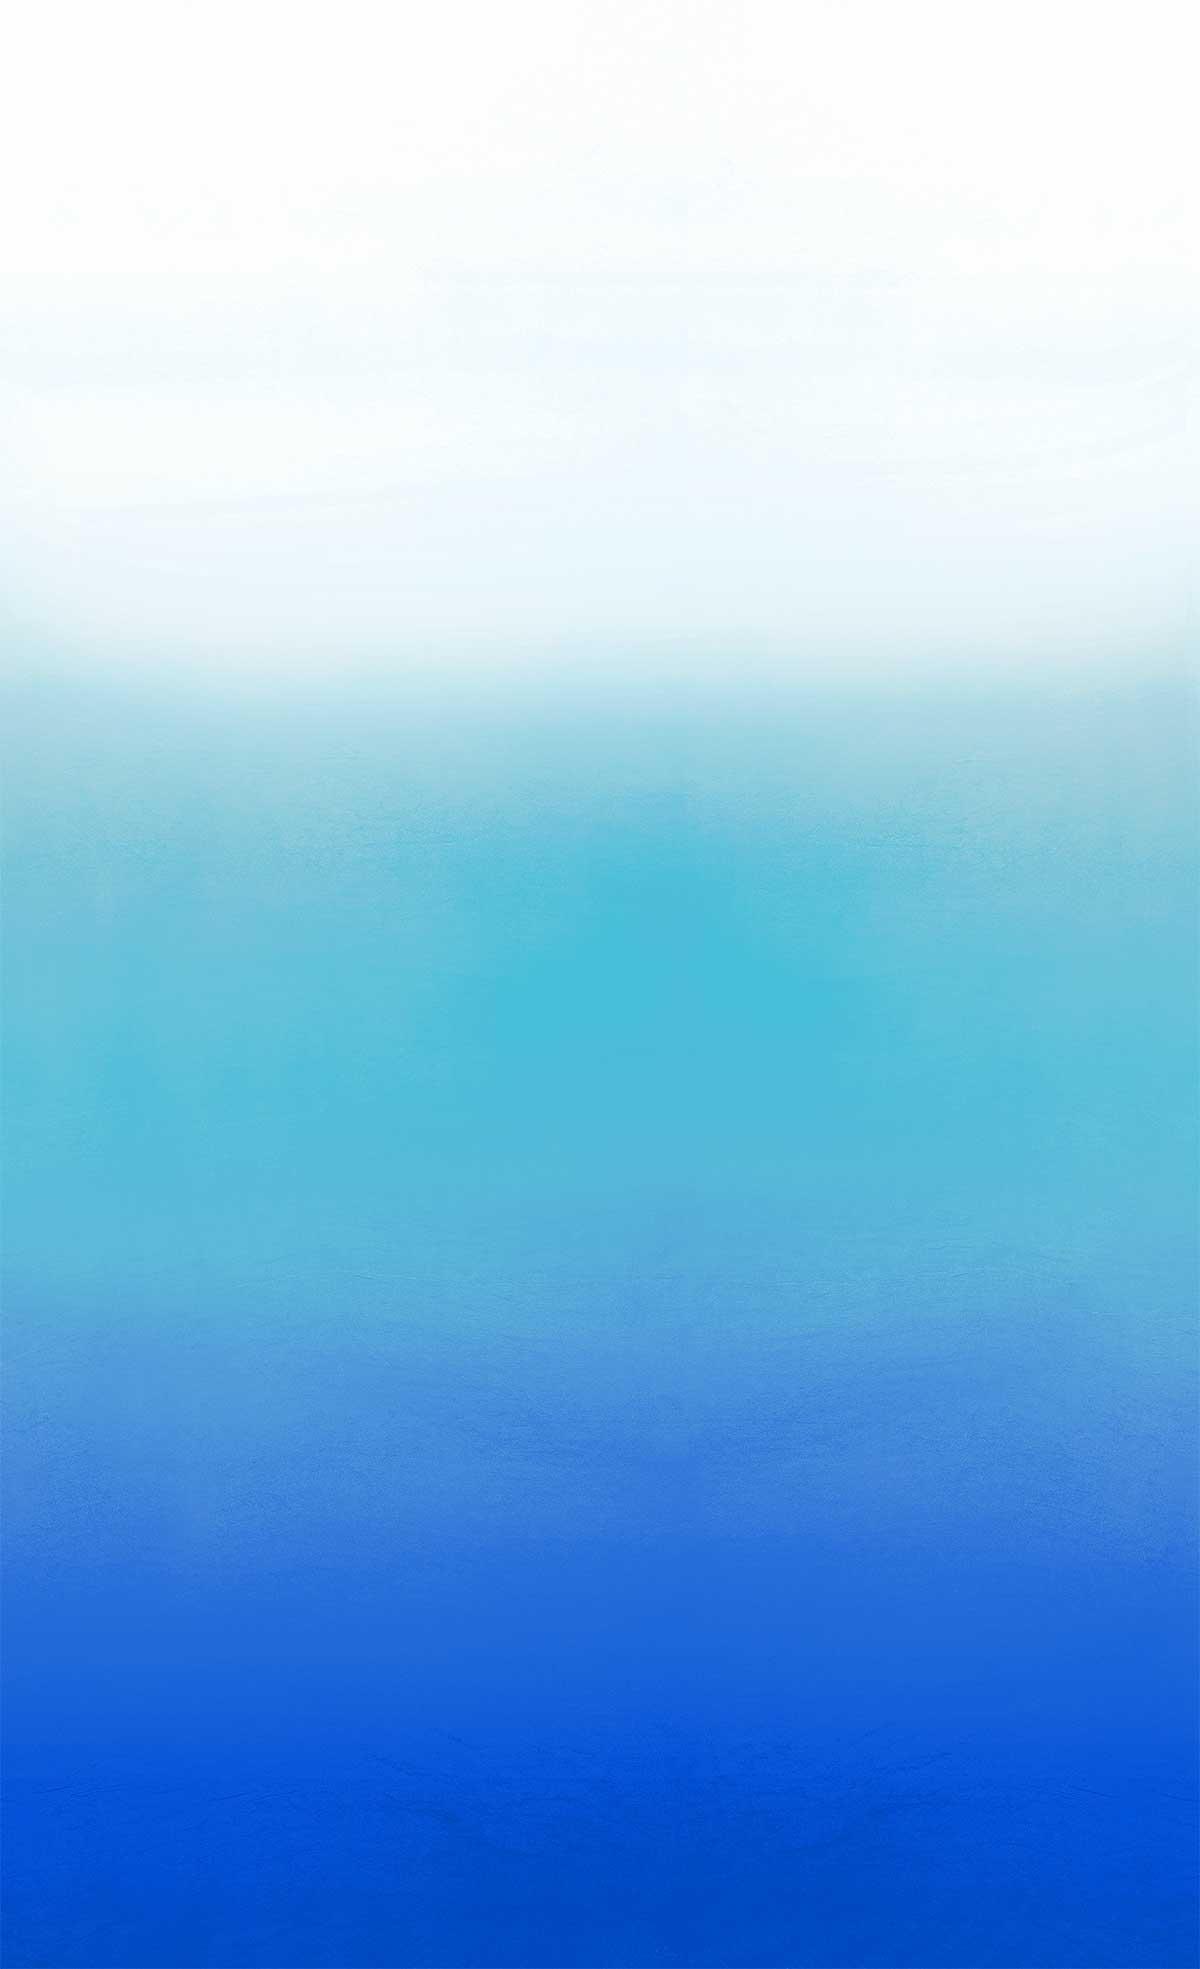 Savoie Mural - Cobalt - by Designers Guild